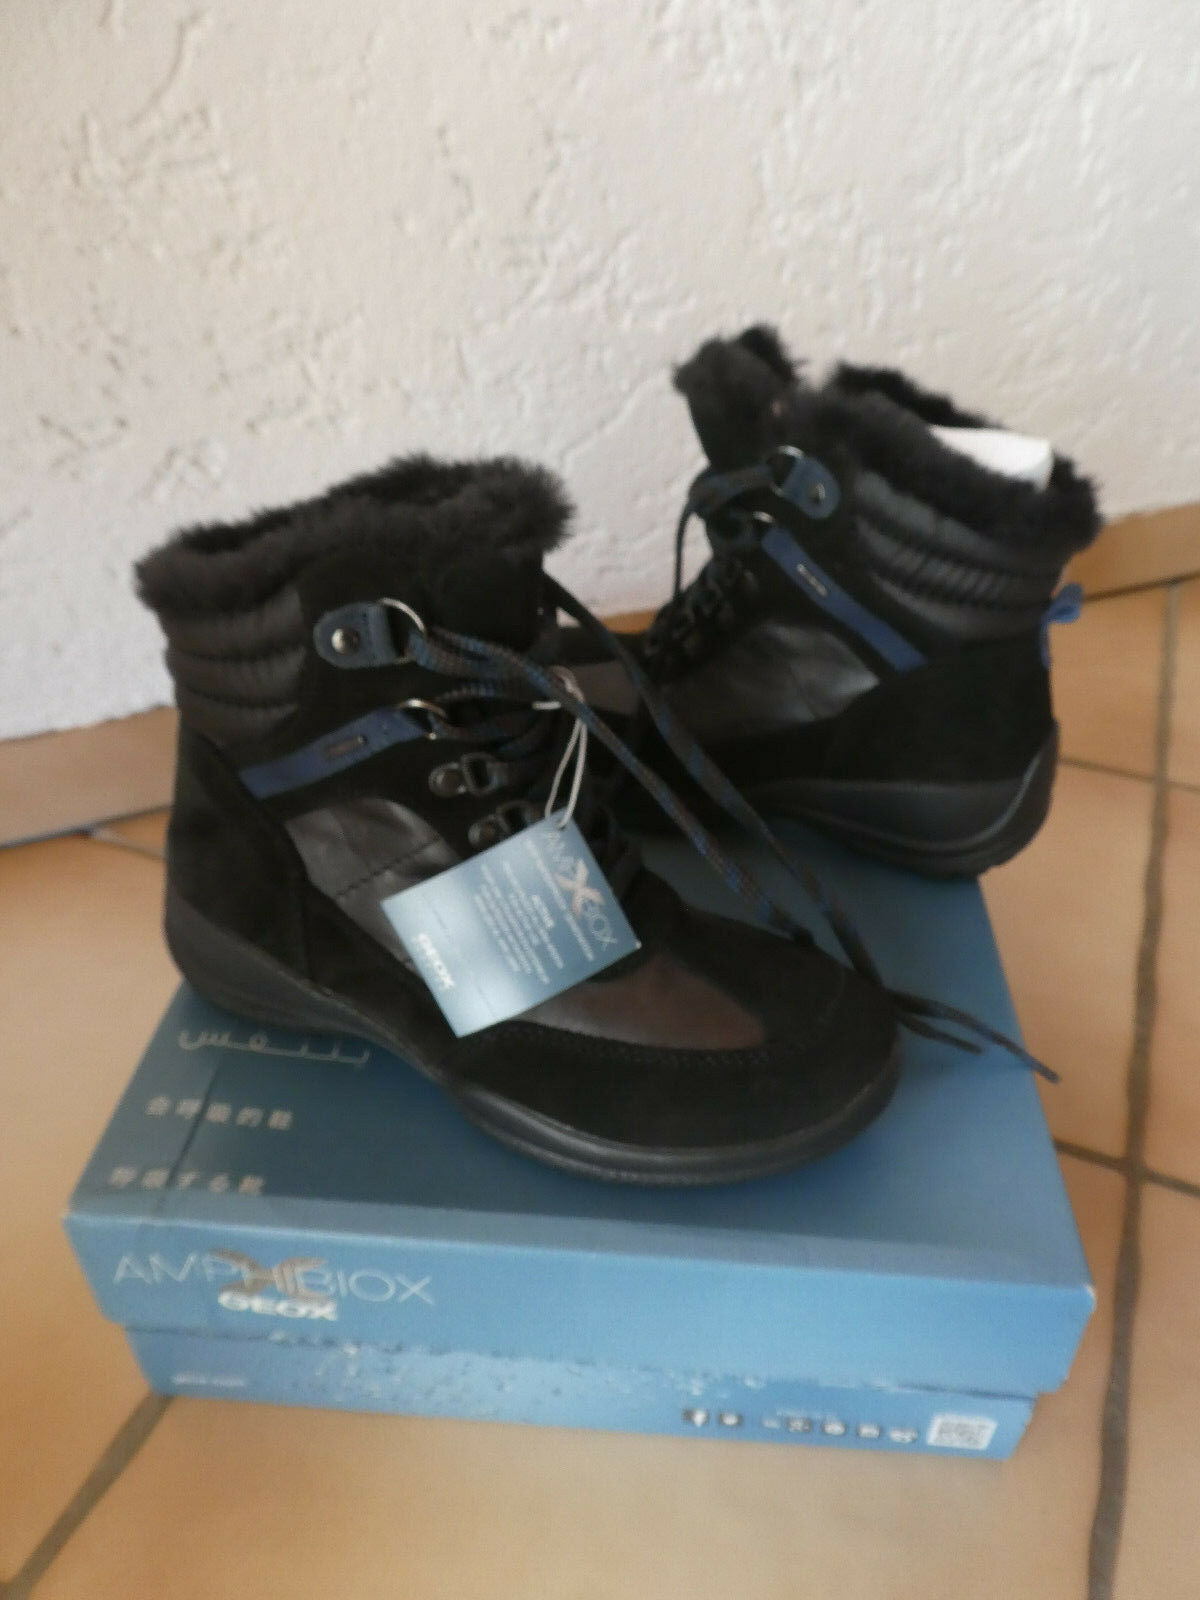 Damen Geox NEU Hellin 35 schwarz e2075aokg54864 Stiefel